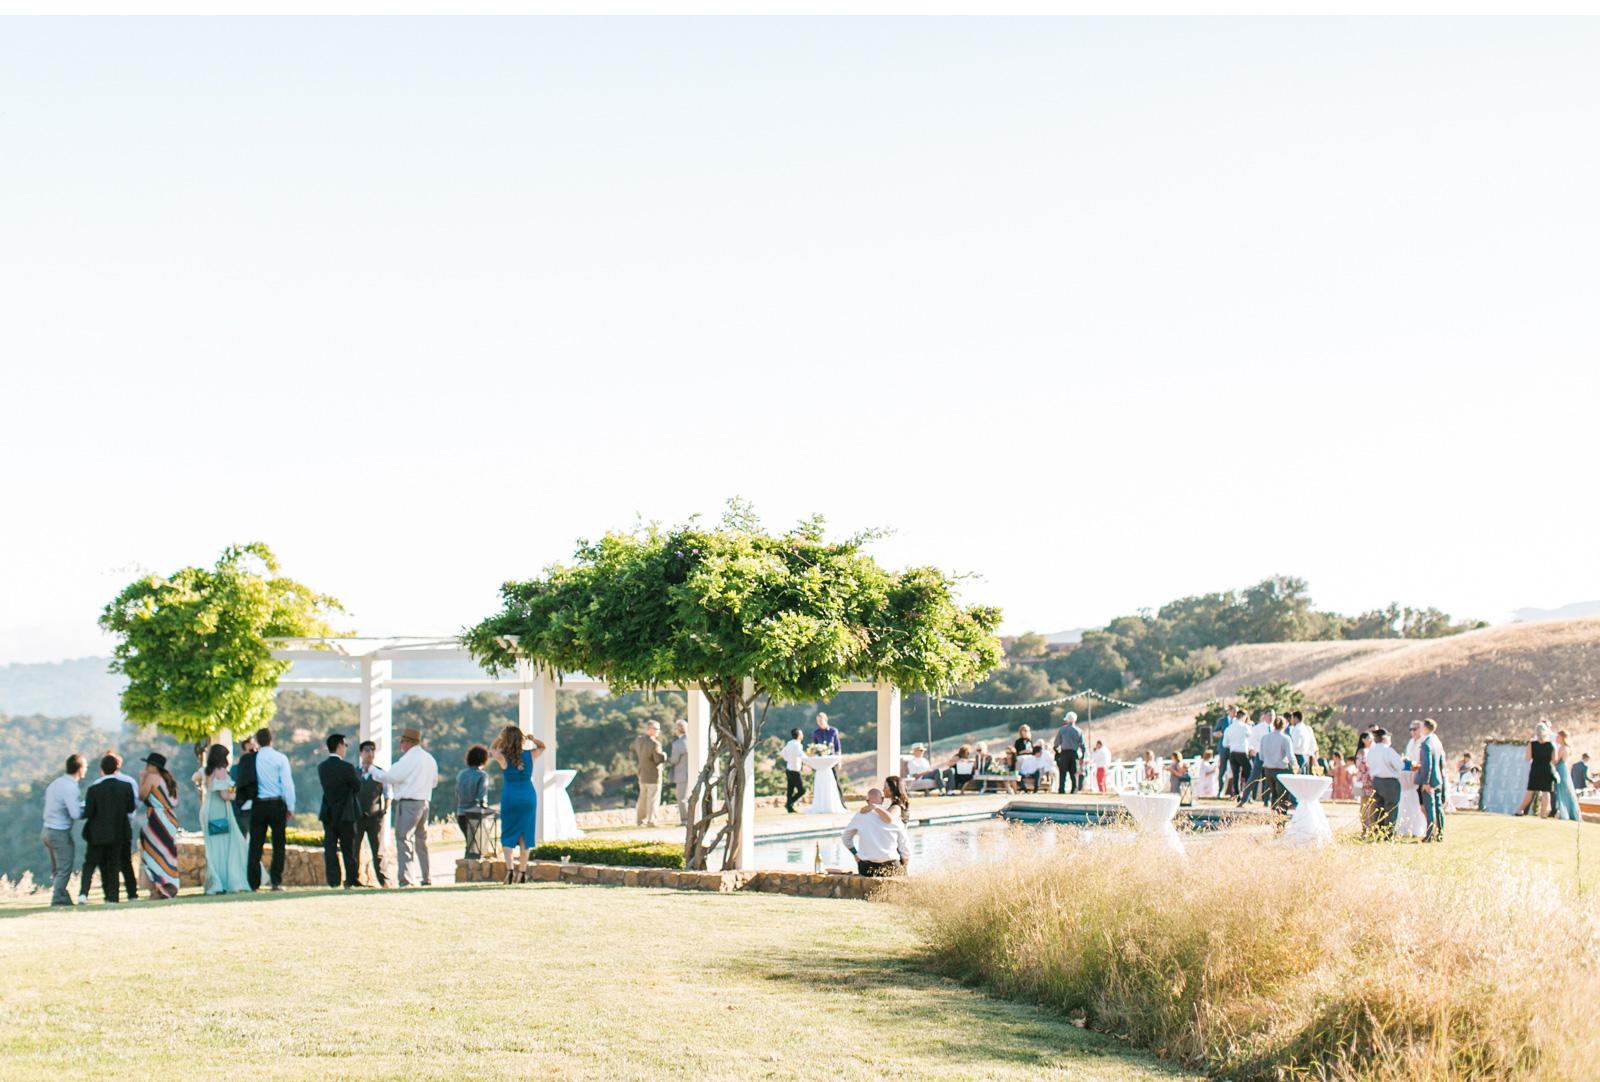 Santa-Ynez-Wedding-Photographer-Sunstone-Winery-Natalie-Schutt-Photography_02.jpg